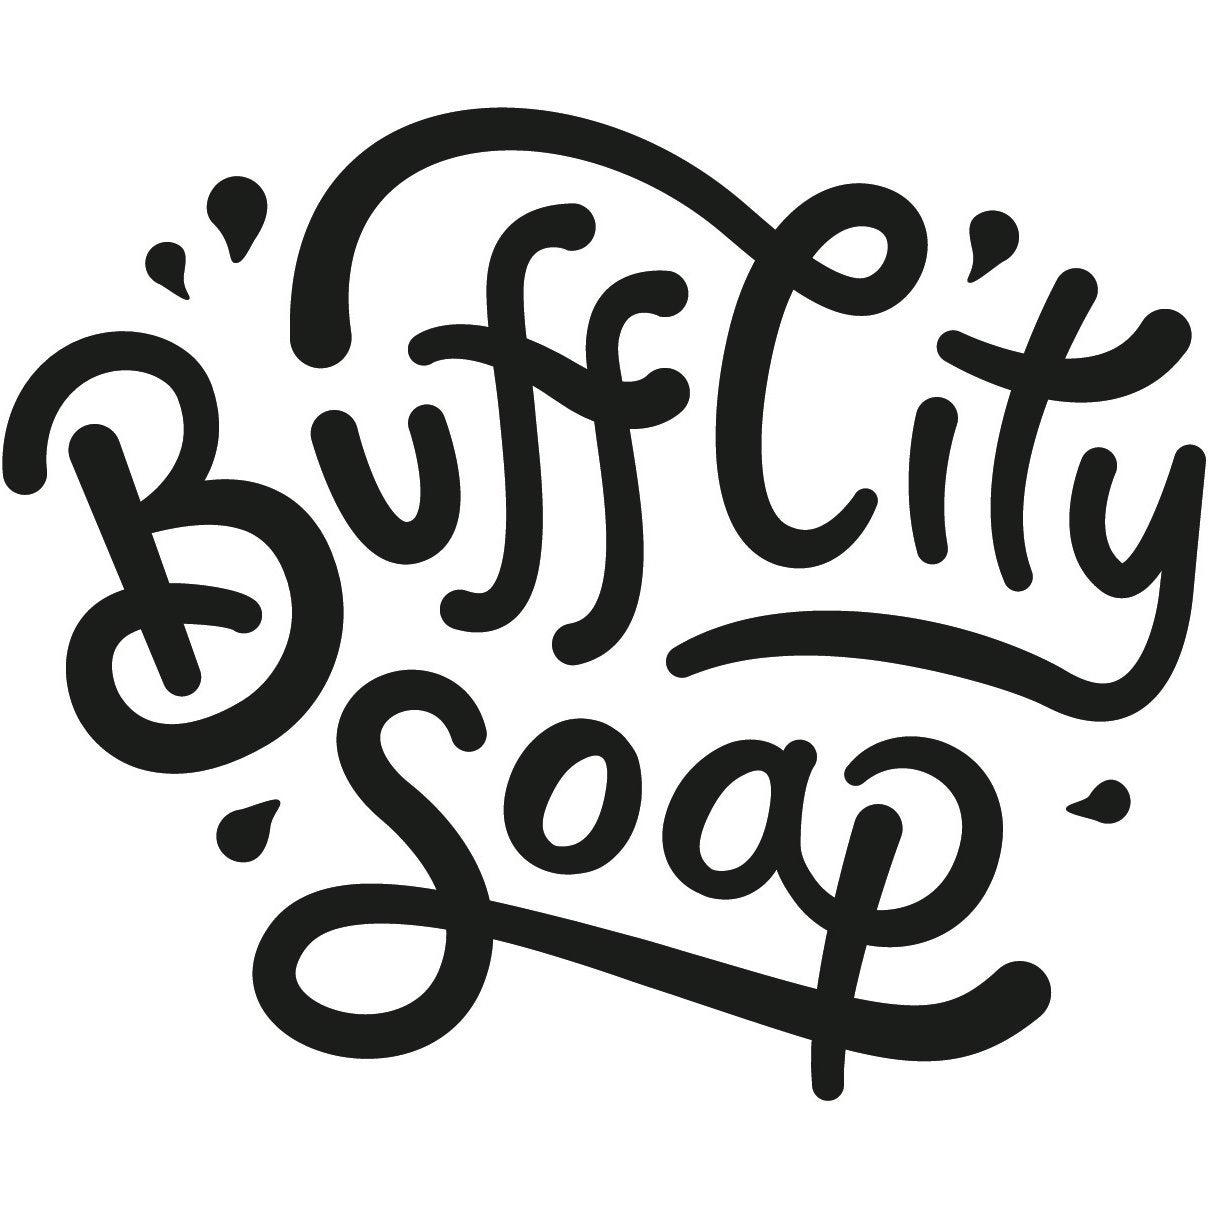 Buff City Soap Co.